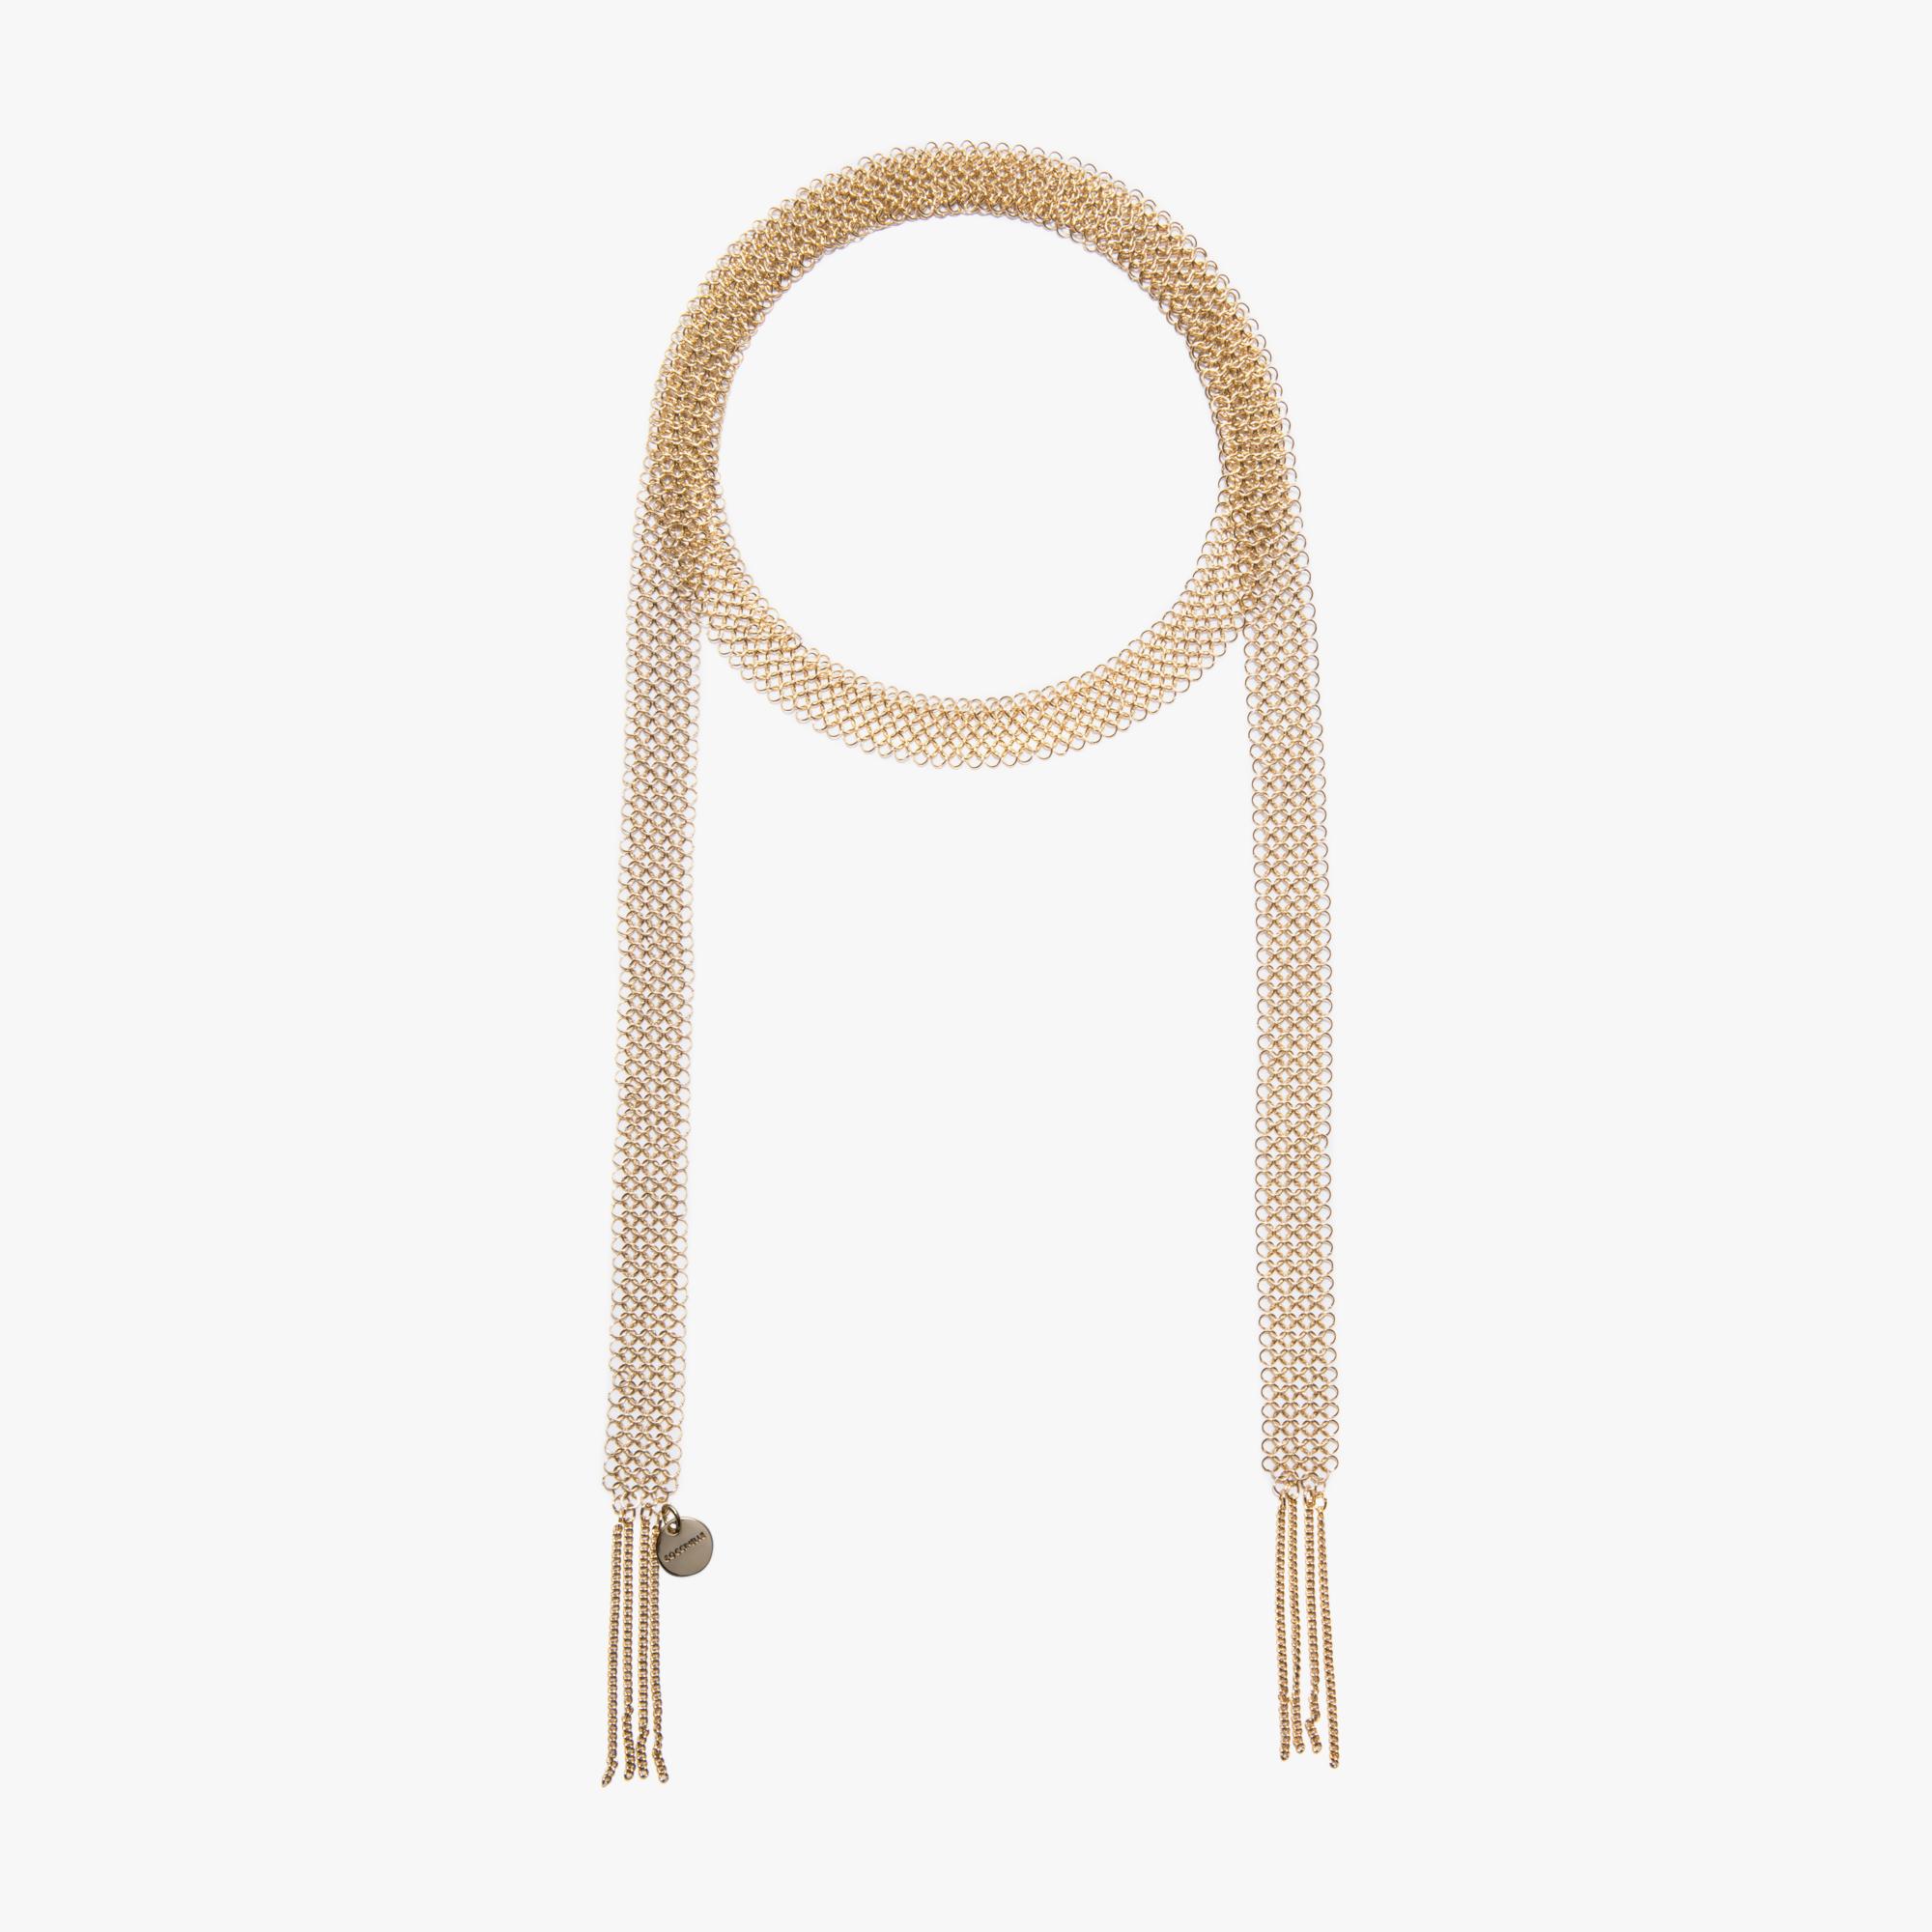 Brass wire-mesh necklace